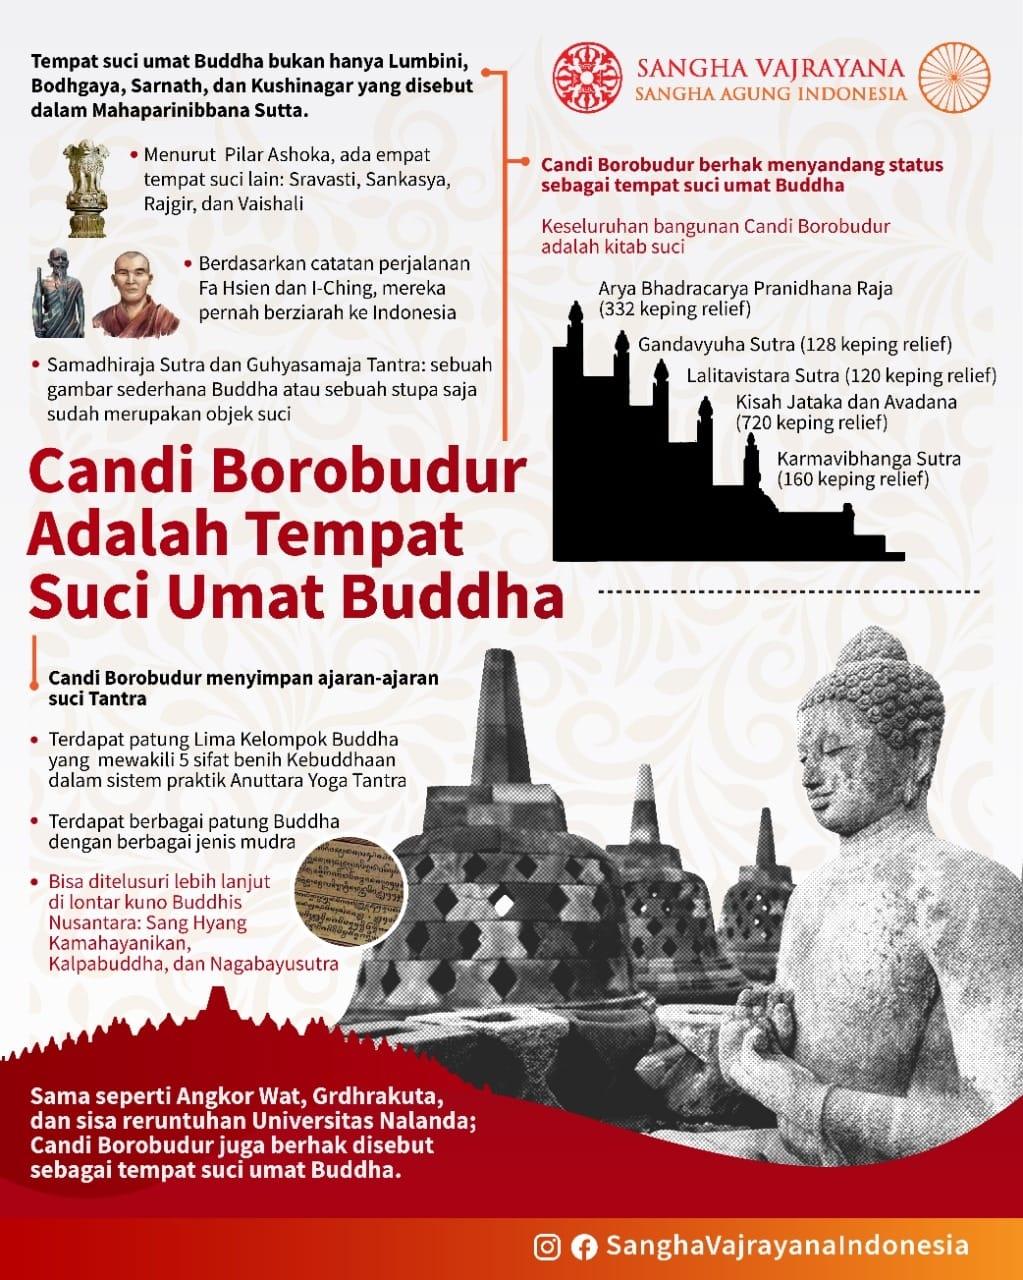 Sumber Foto: Sangha Vajrayana Indonesia